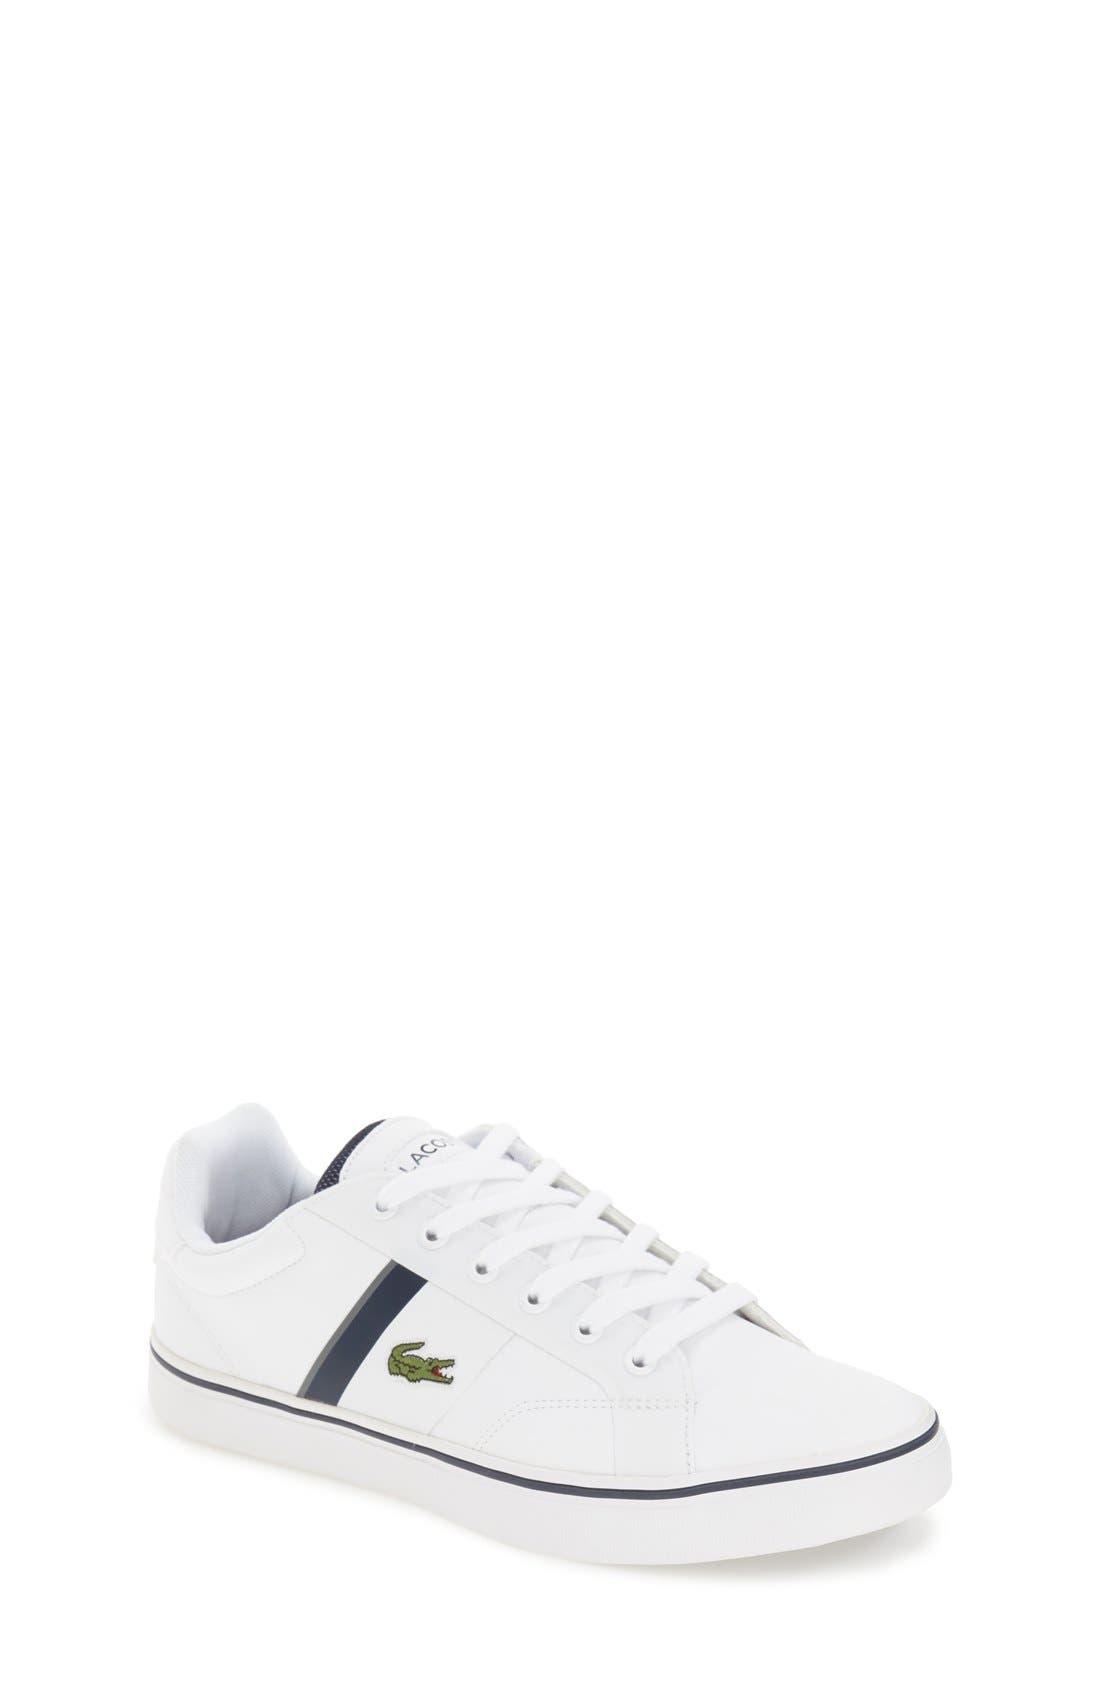 Alternate Image 1 Selected - Lacoste 'Fairland' Sneaker (Women)